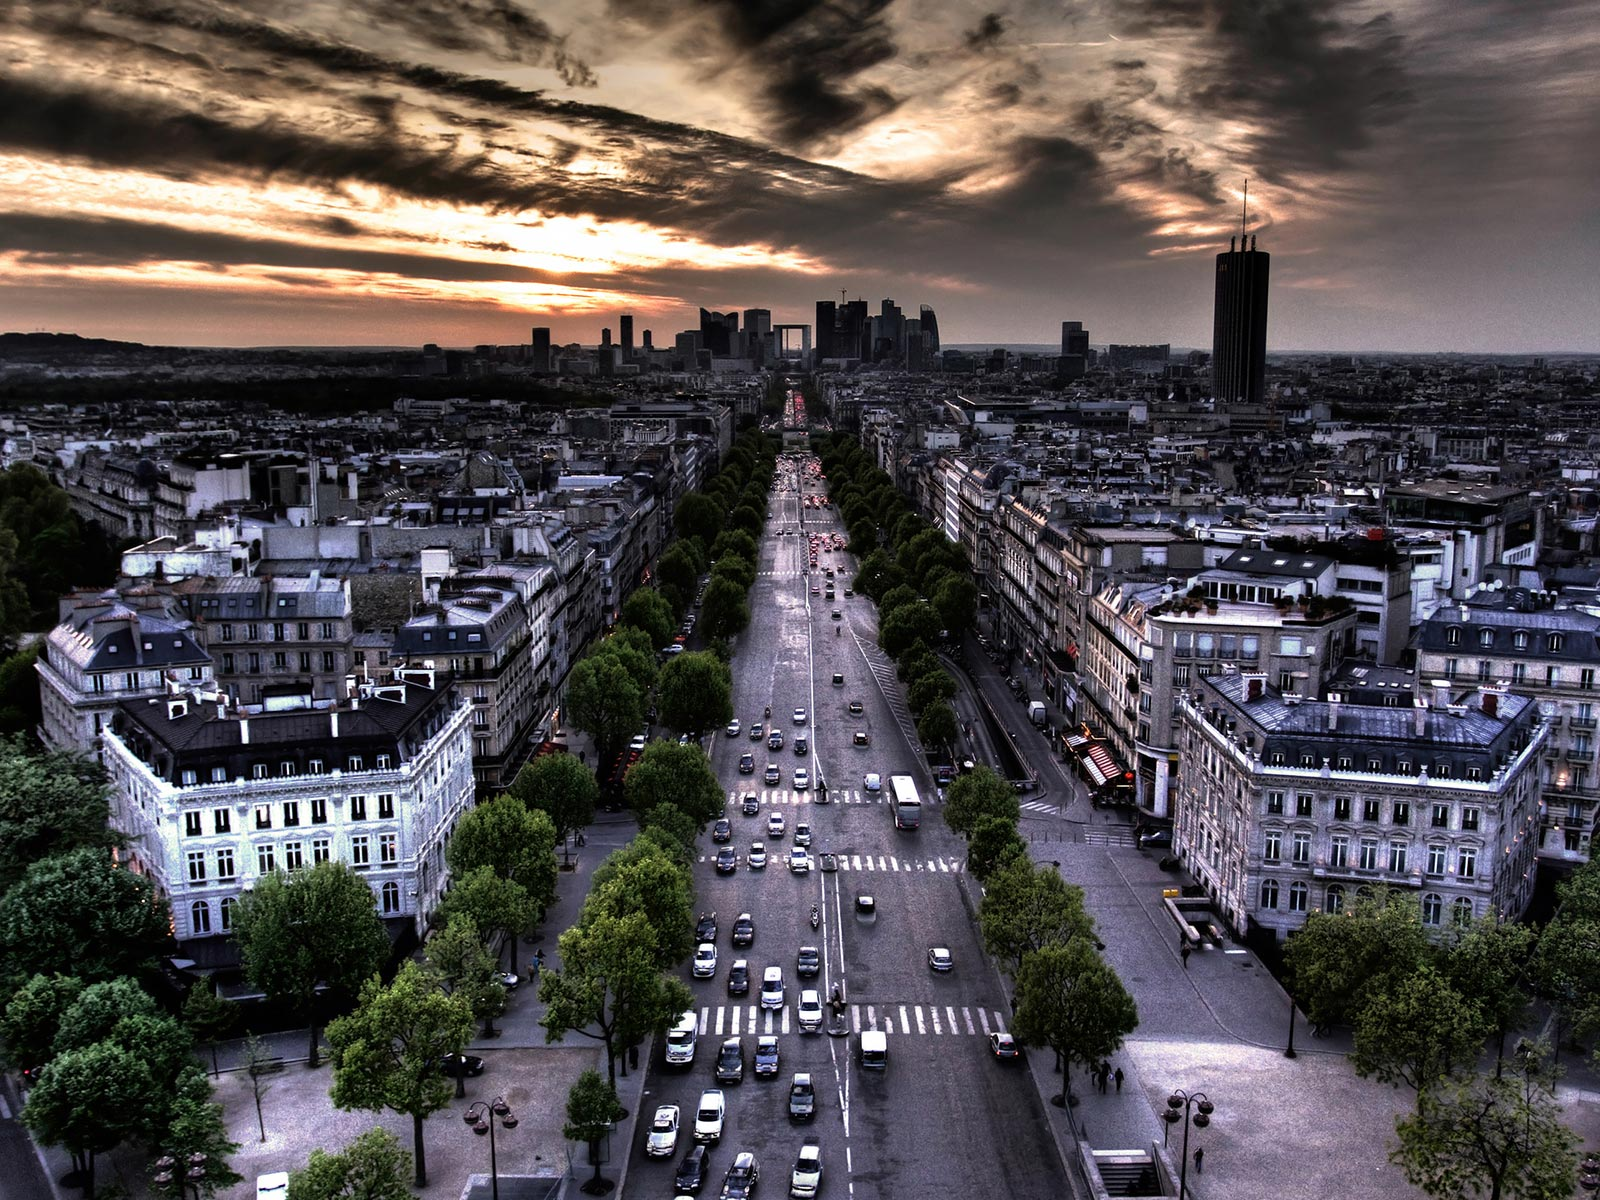 Desktop Wallpaper Gallery Travels Capital Of France Paris